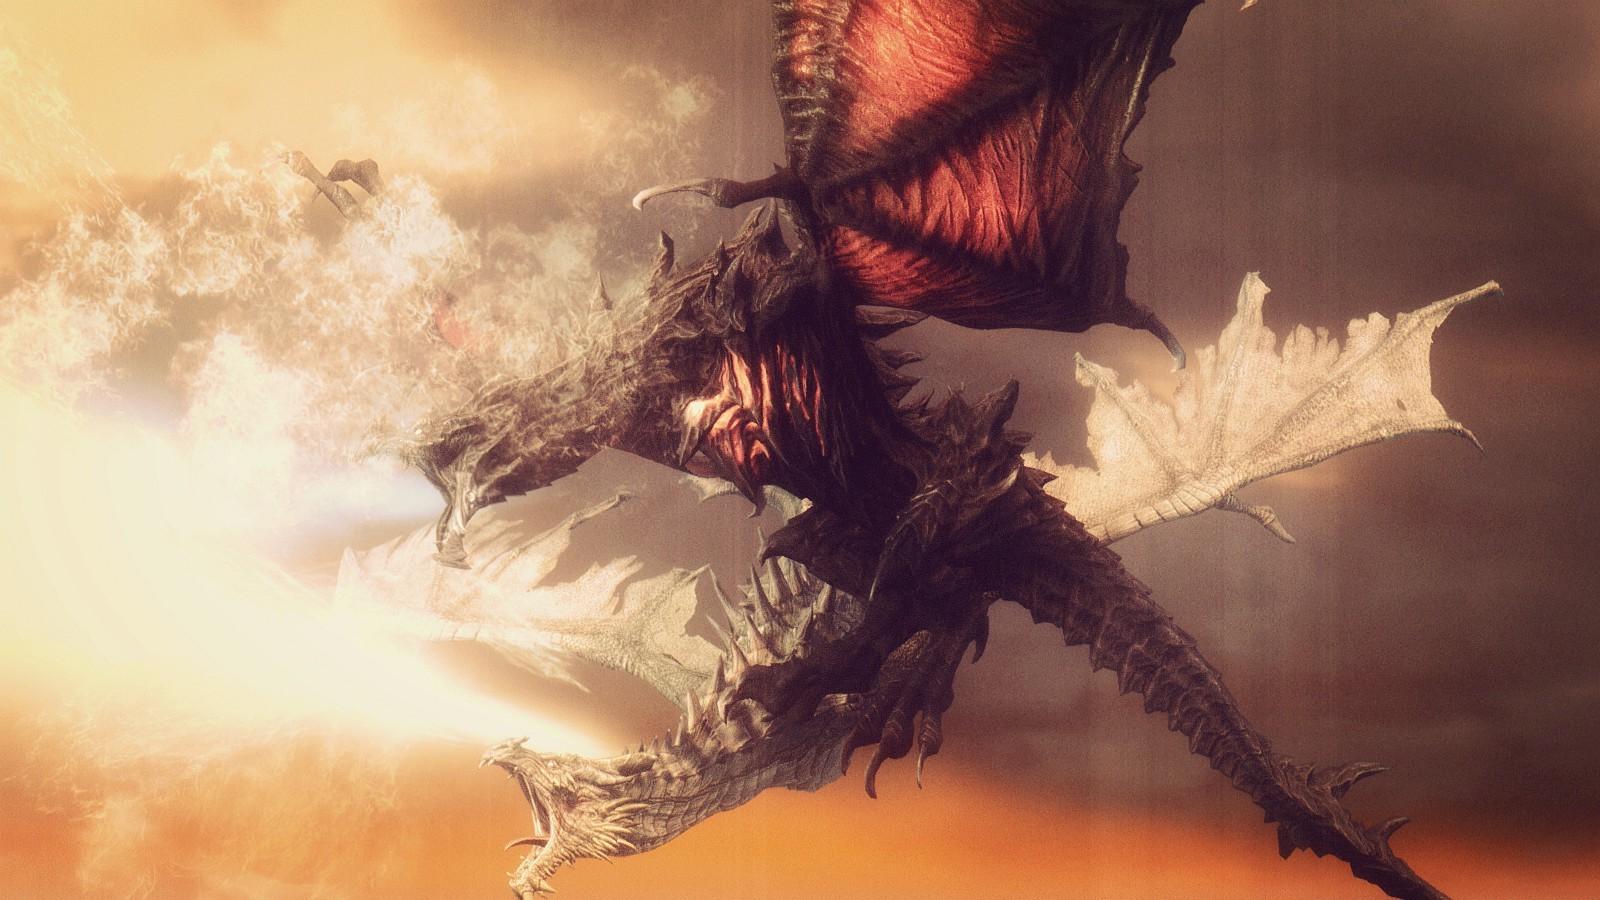 1600x900_px_dragon_The_Elder_Scrolls_V_Skyrim-658474.jpg!d.jpg - Elder Scrolls 5: Skyrim, the Дракон